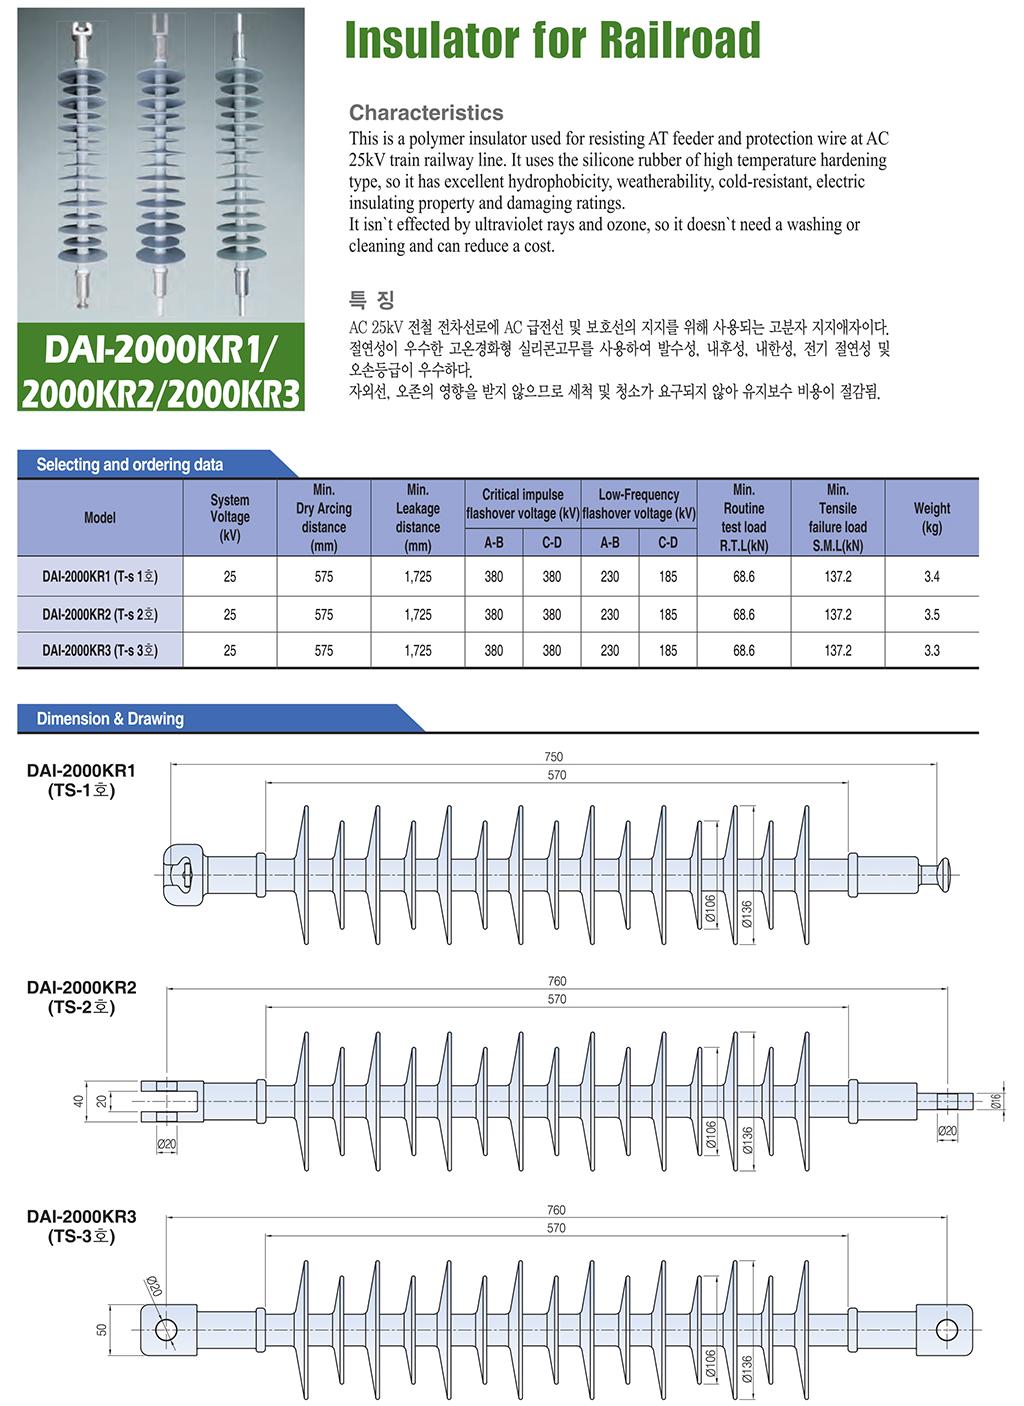 DONGWOO Insulator for Railroad DAI-2000KR1/2000KR2/2000KR3